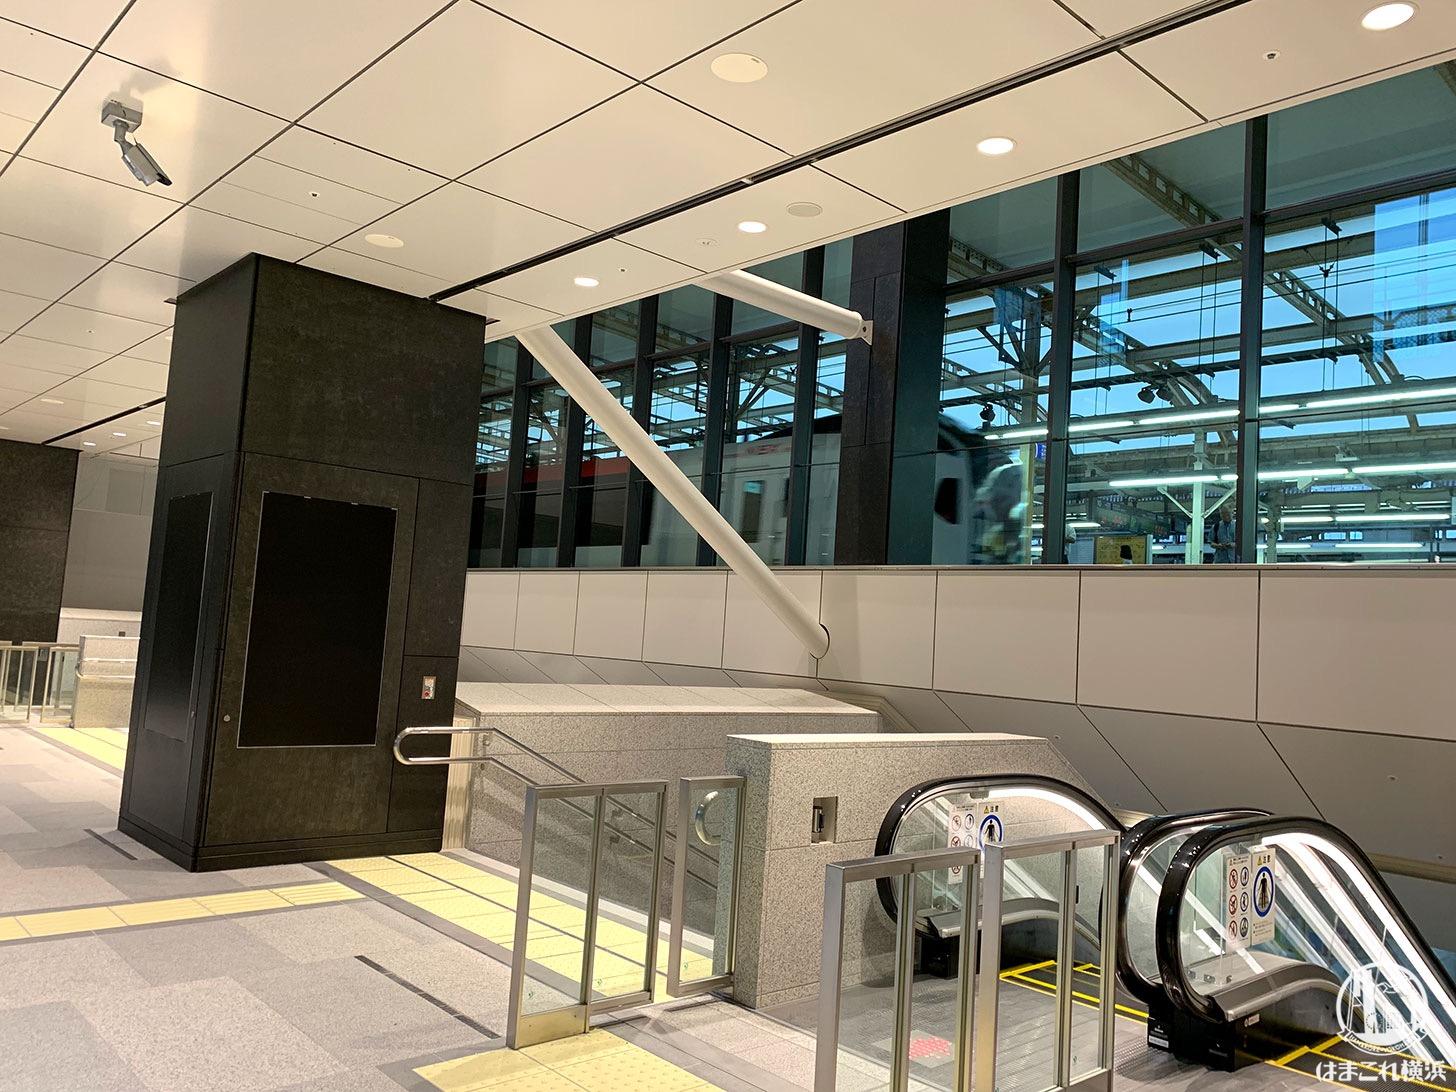 https://hamakore.yokohama/wp-content/uploads/2019/07/yokohama-station-atrium-report-03.jpg